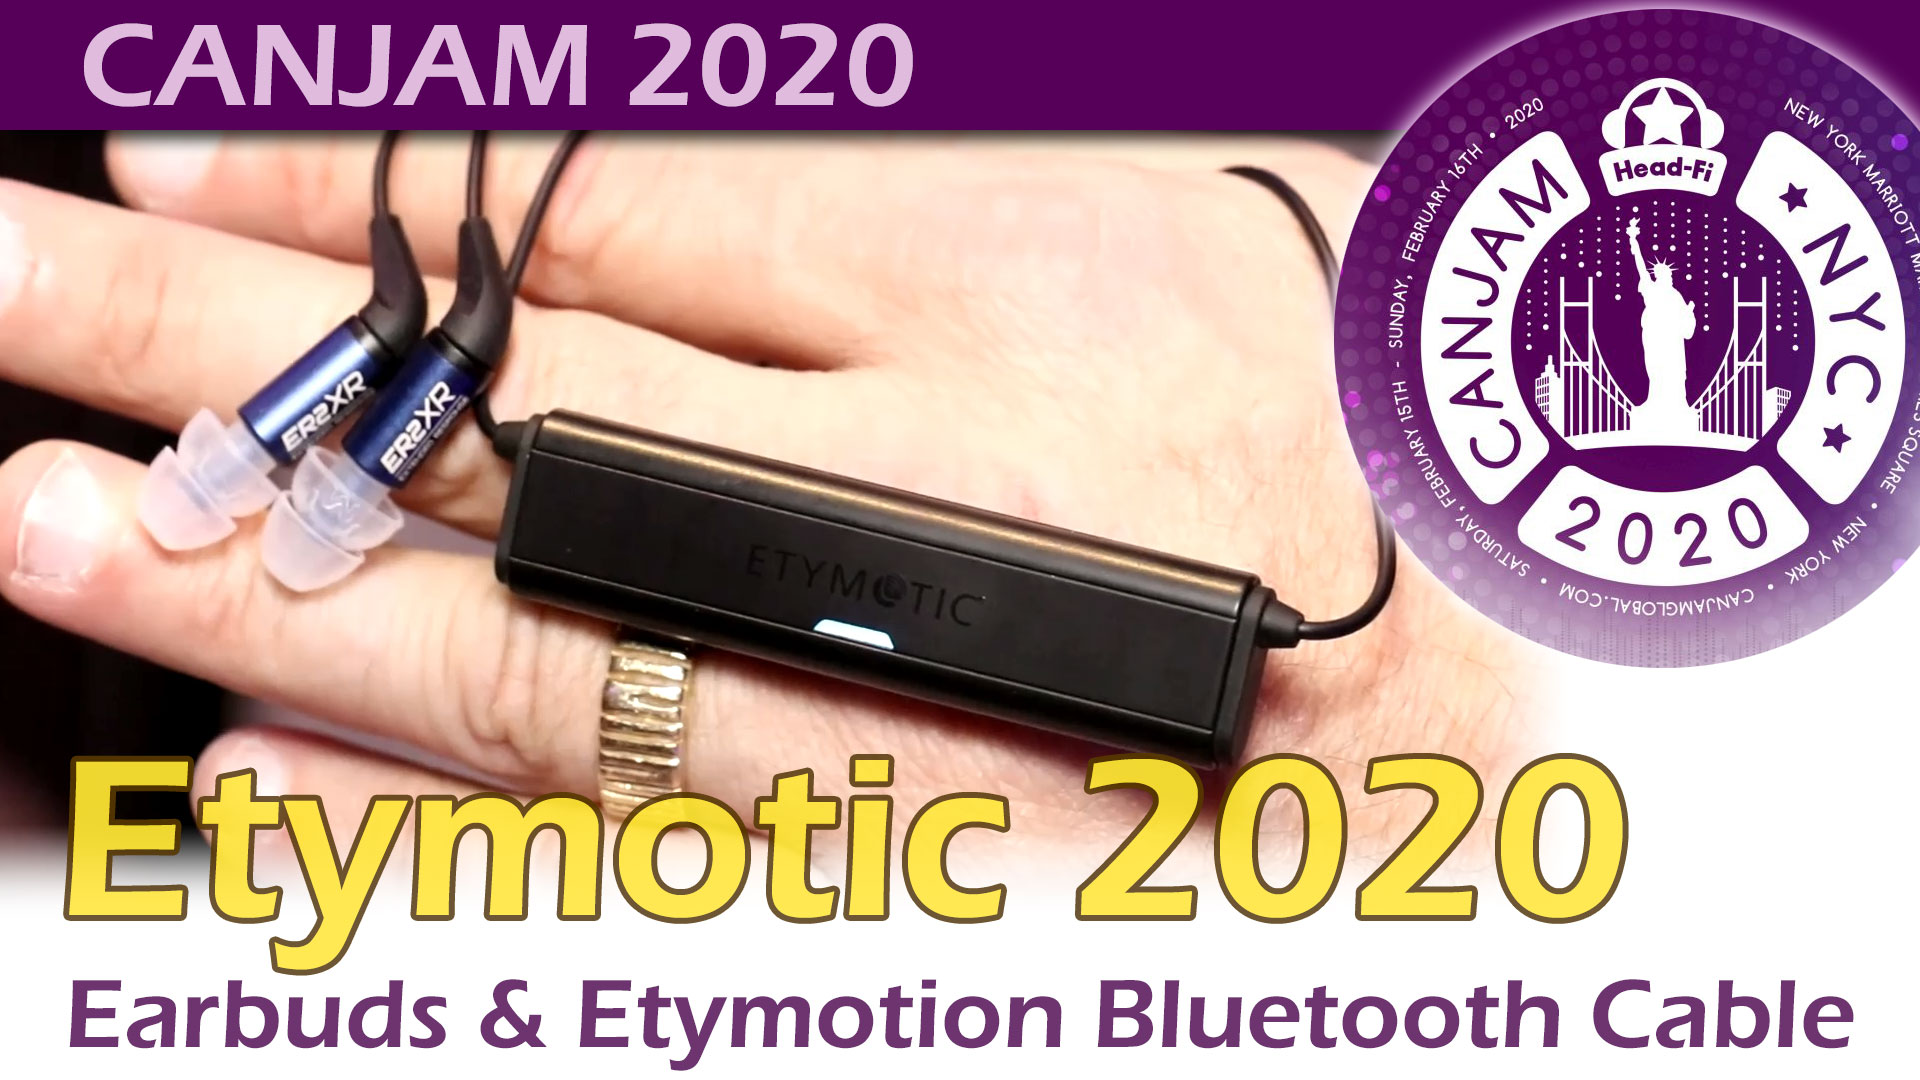 Etymotic @CanJam 2020